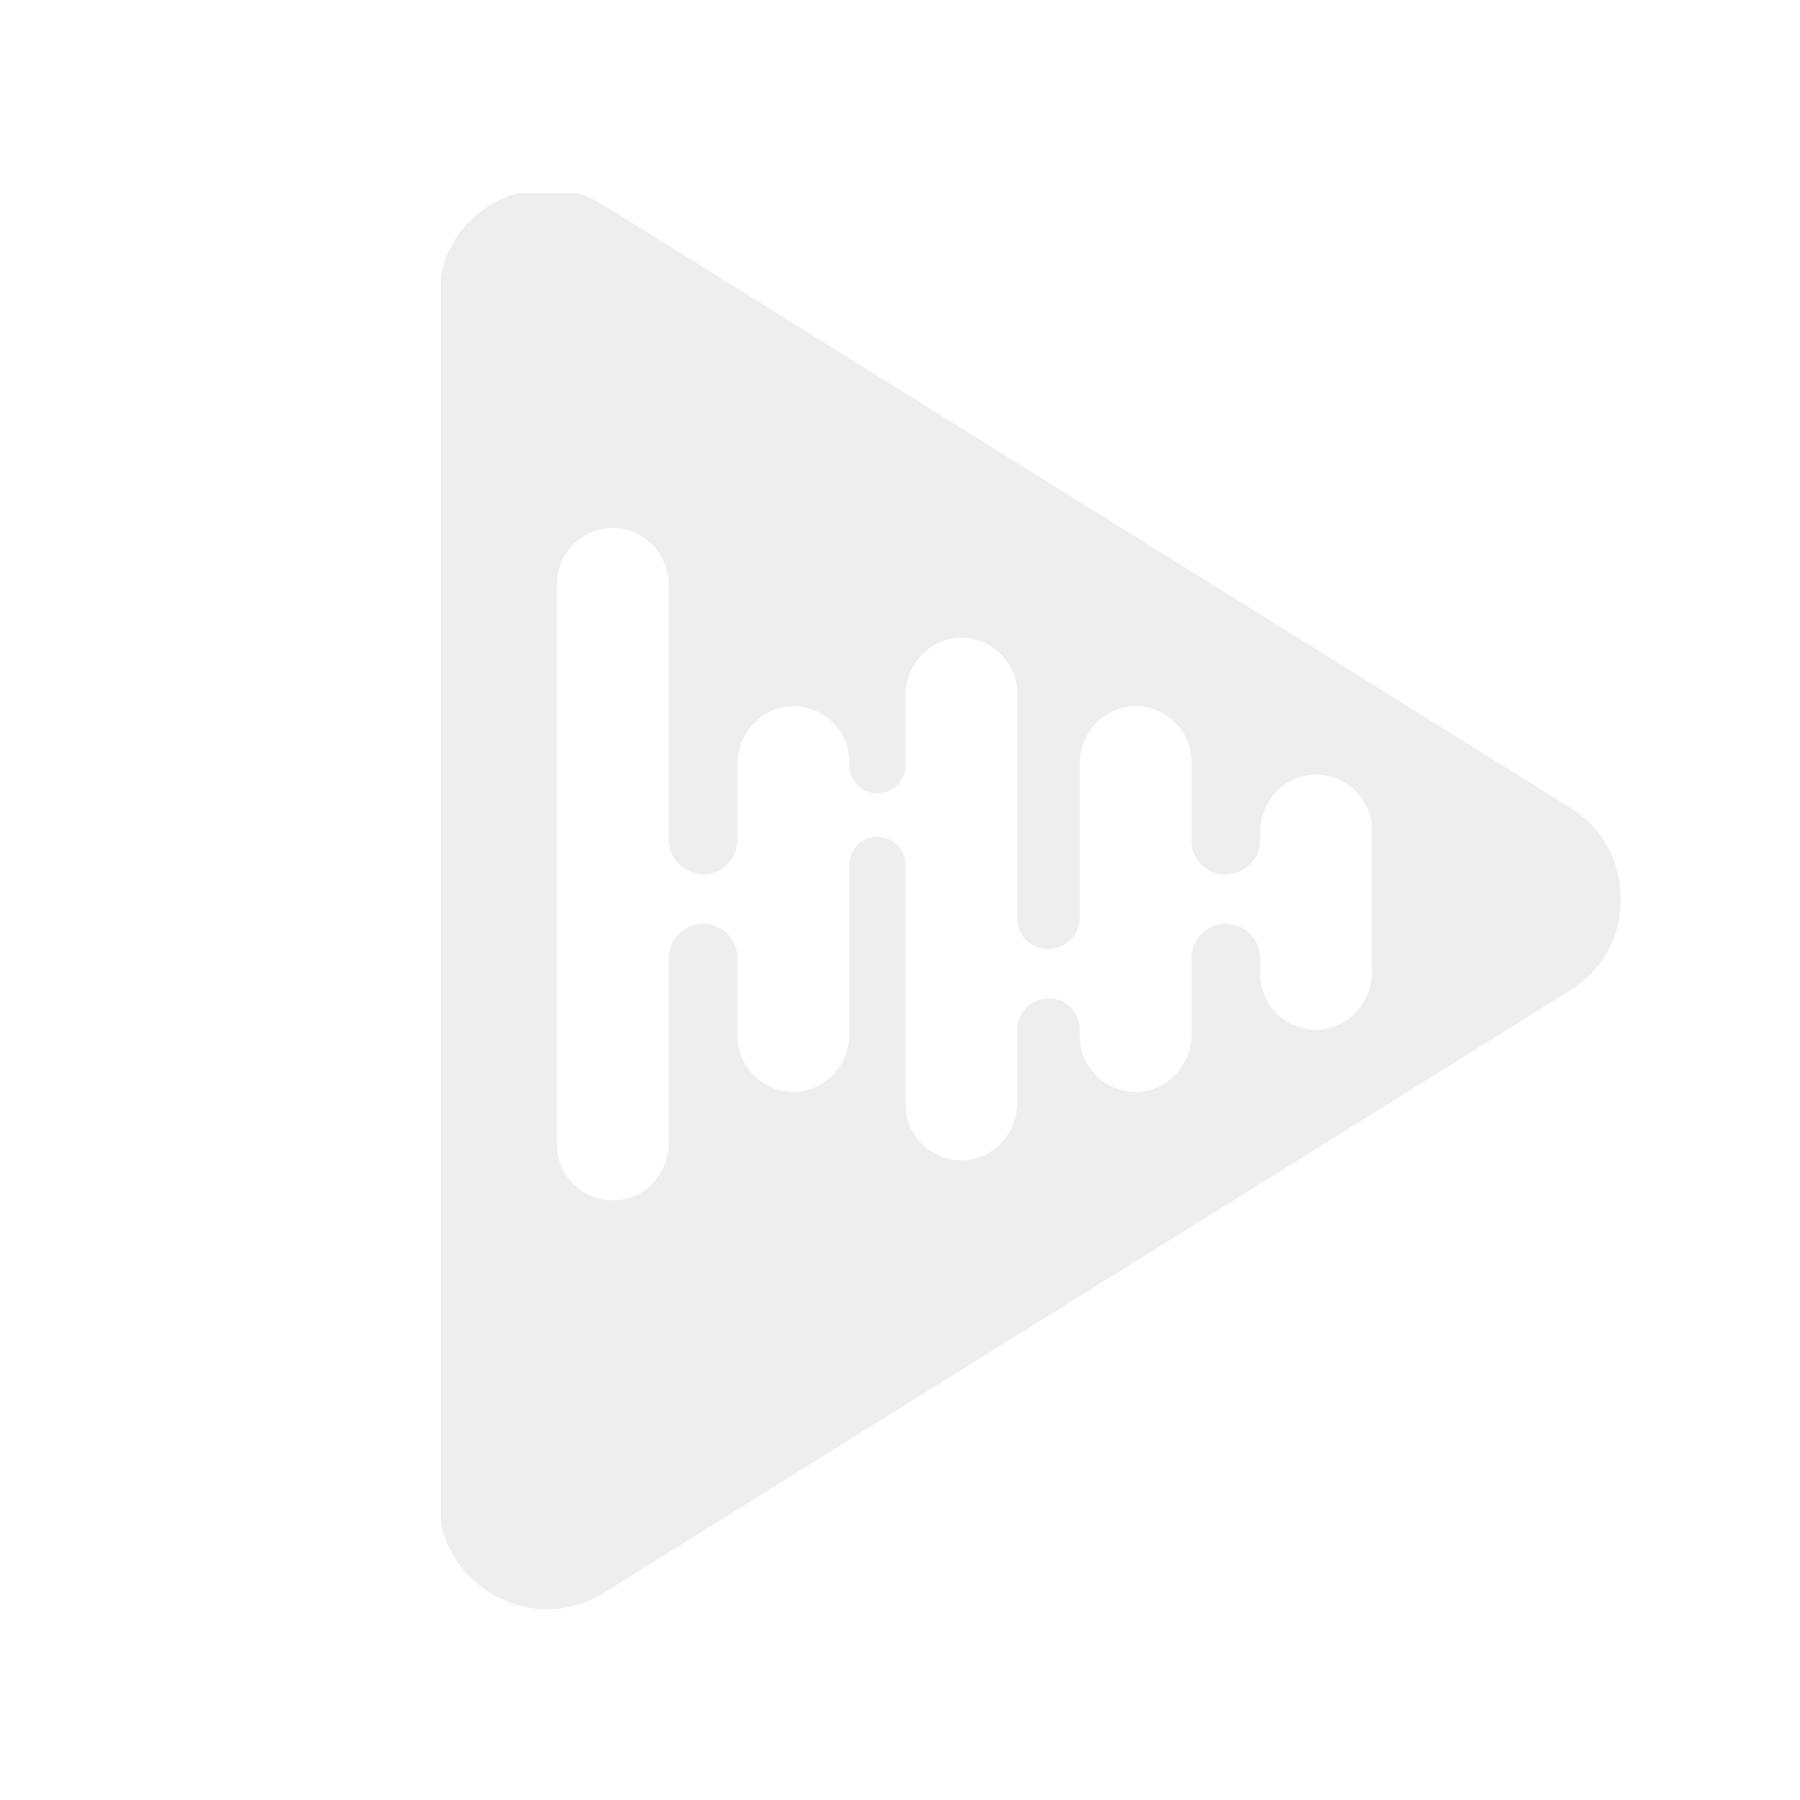 Kufatec Fistune 40148 - DAB-integrering, BMW